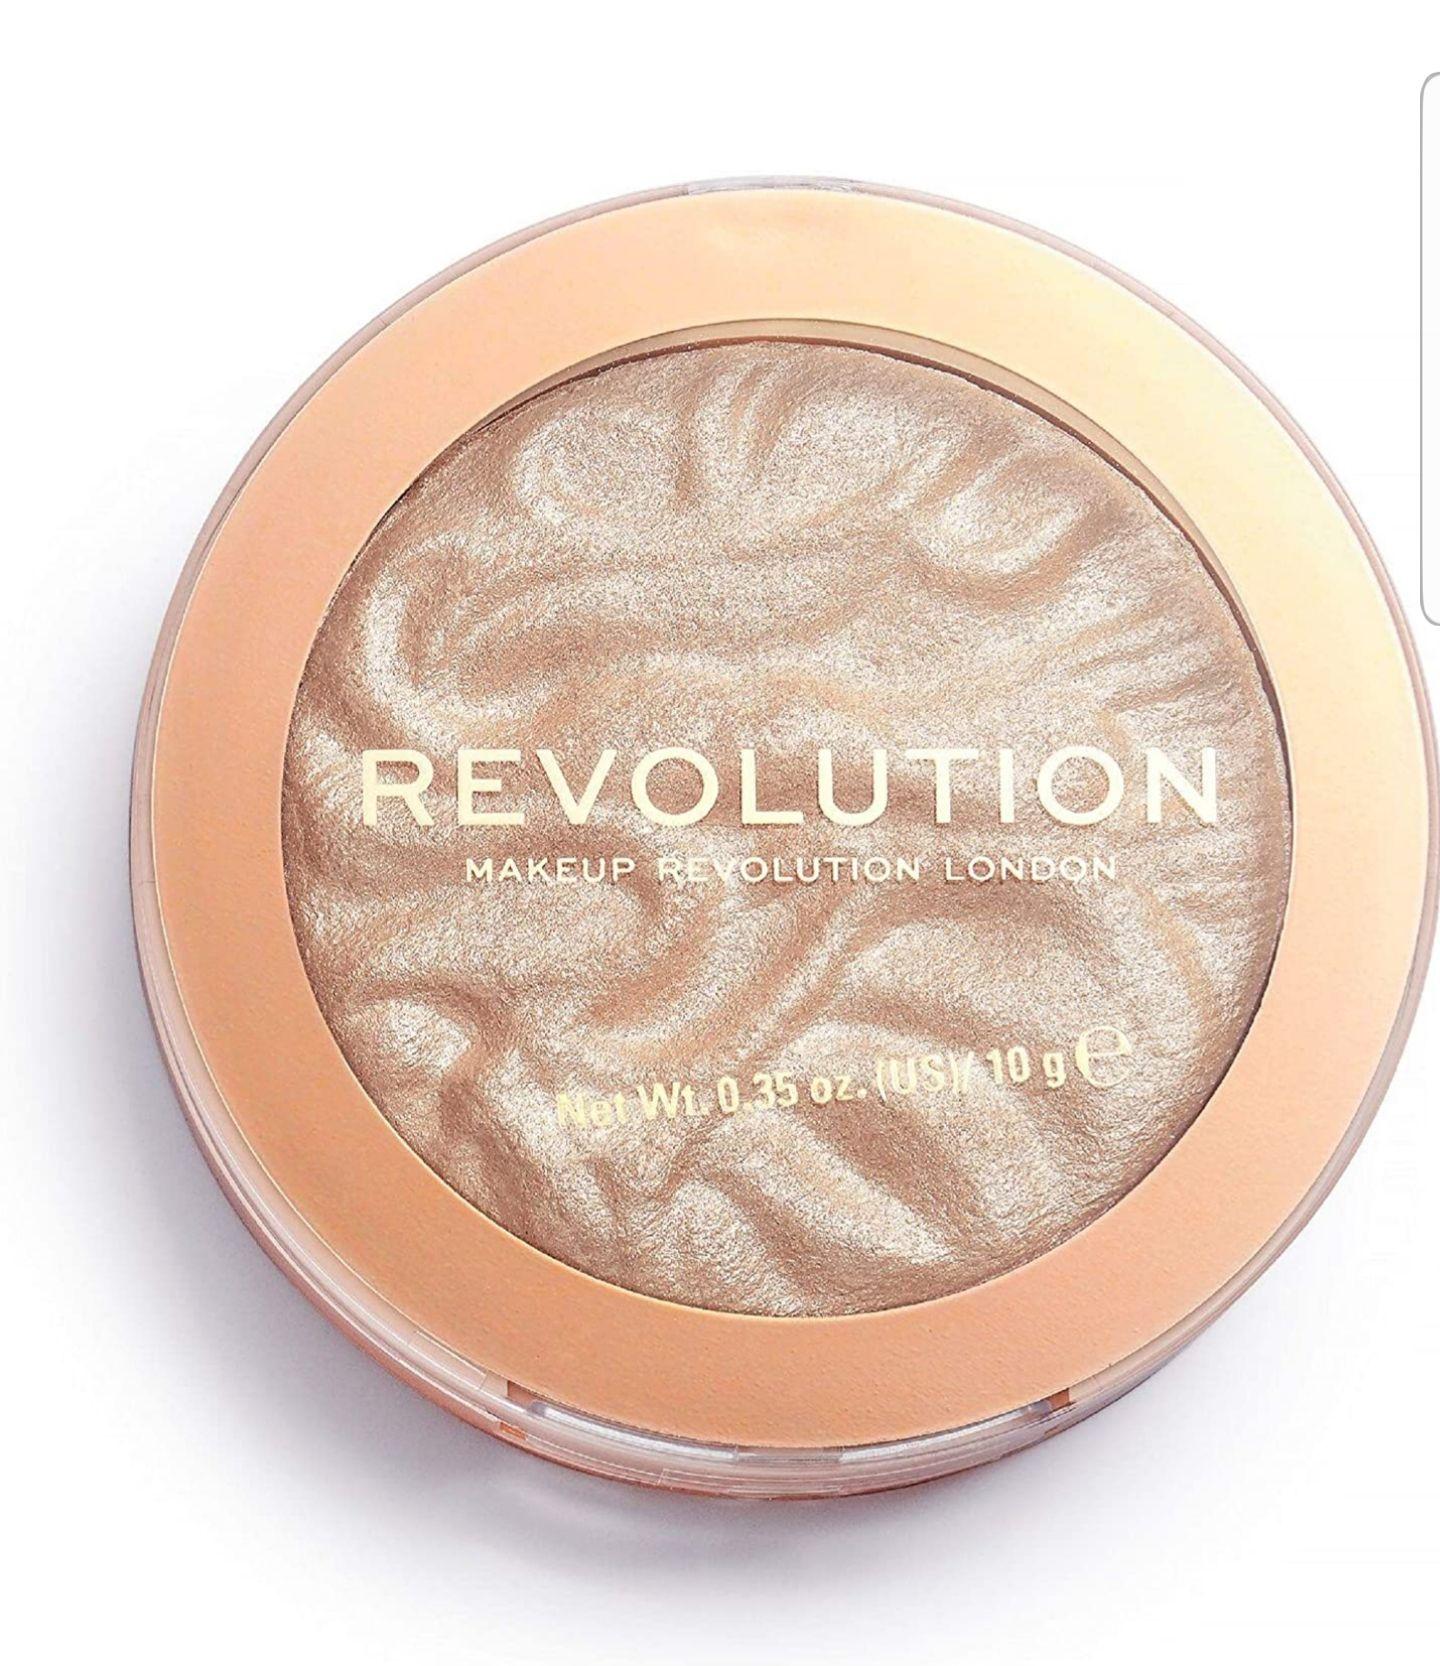 Makeup Revolution London